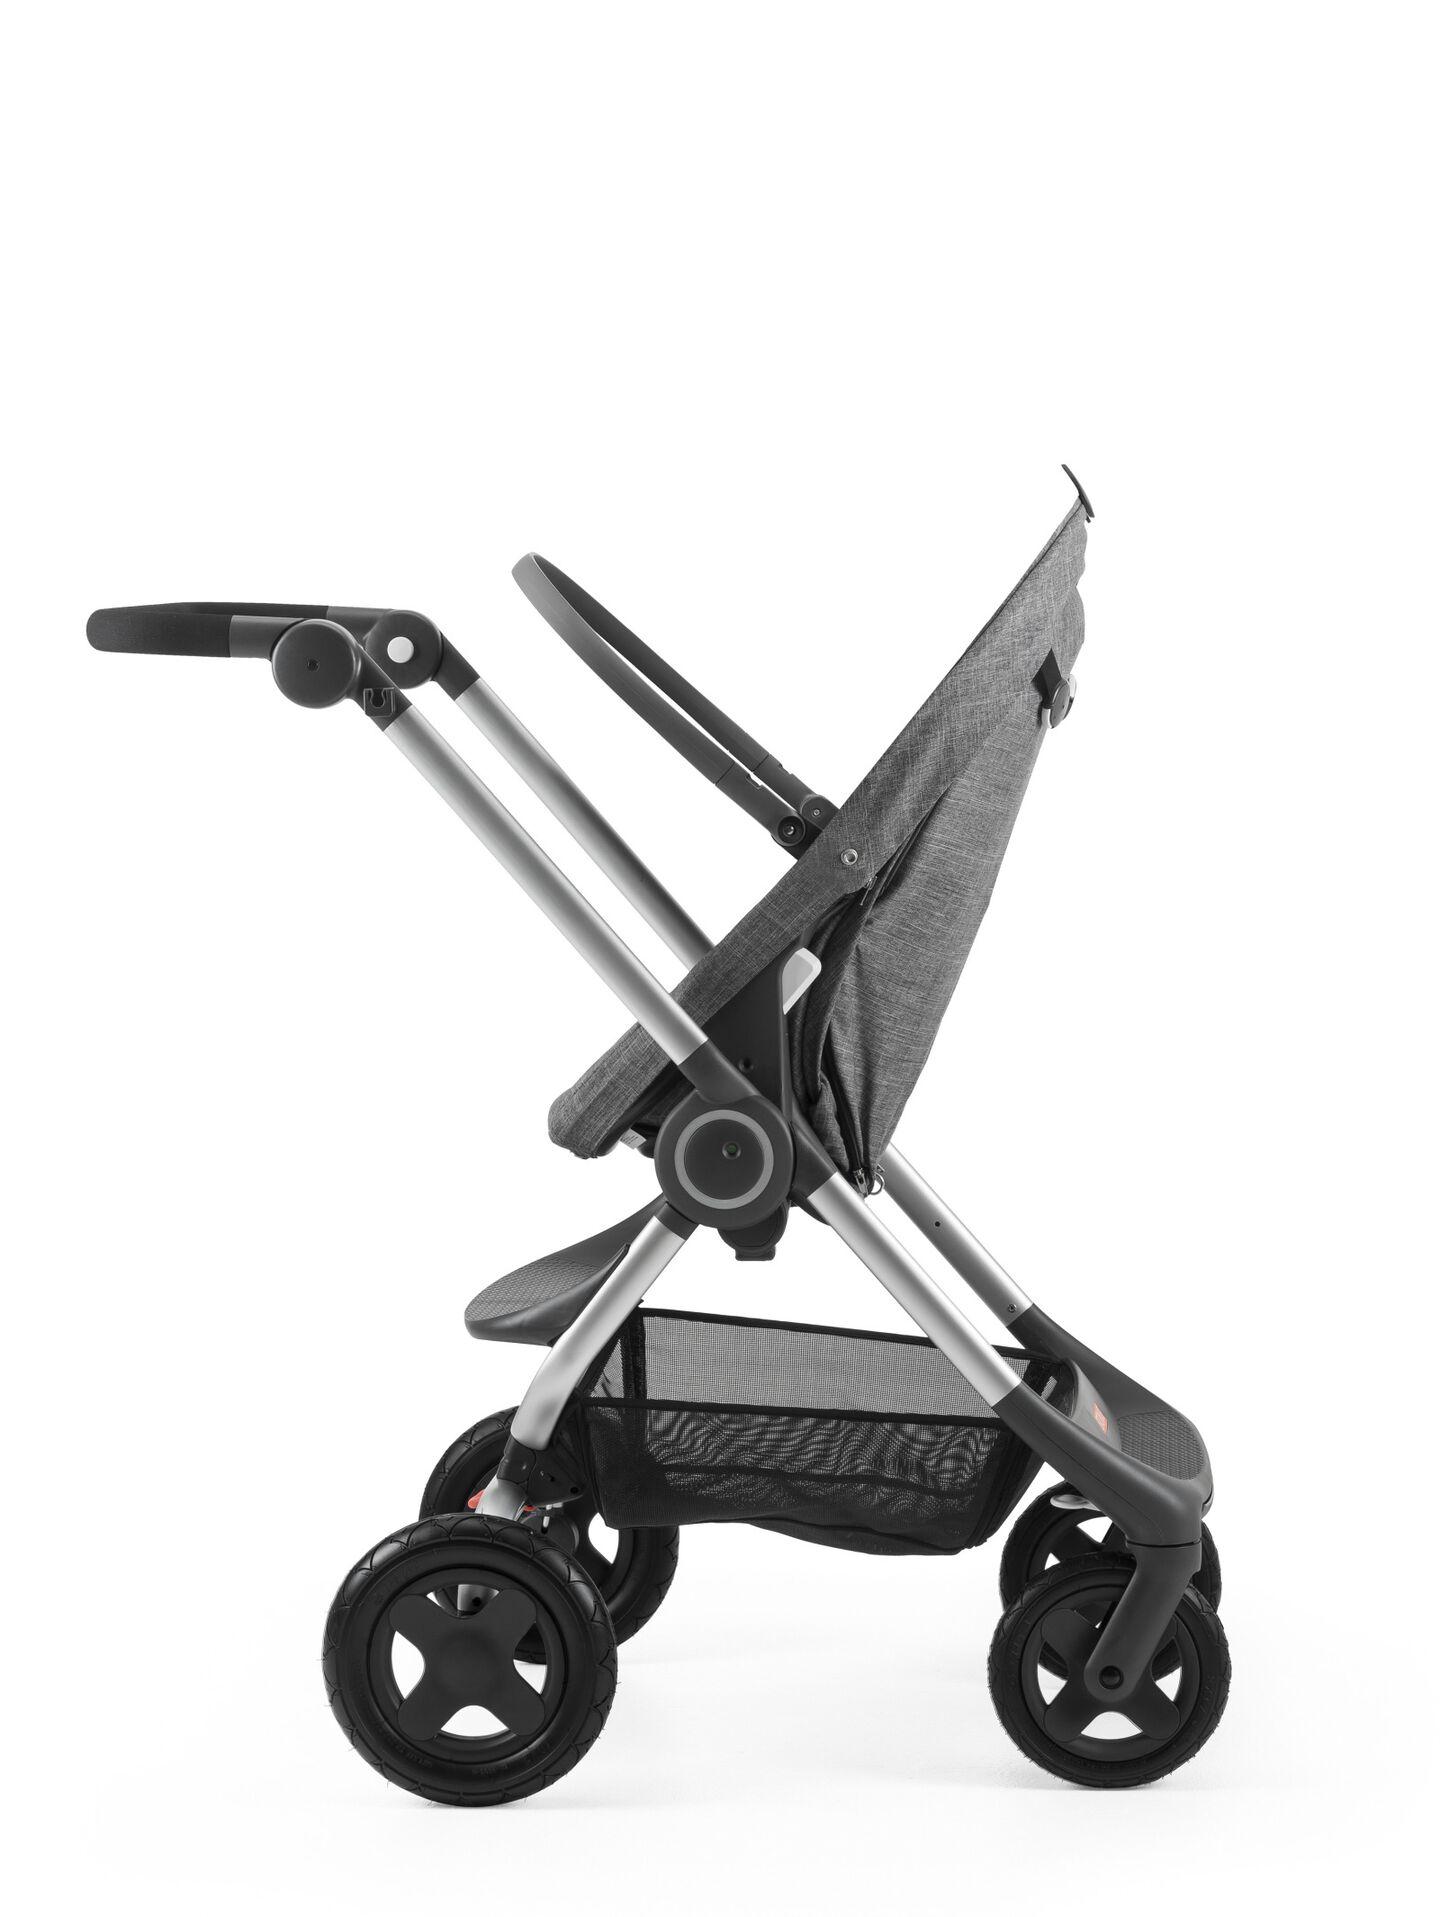 Stokke® Scoot™ Seat without Canopy, Black Melange.